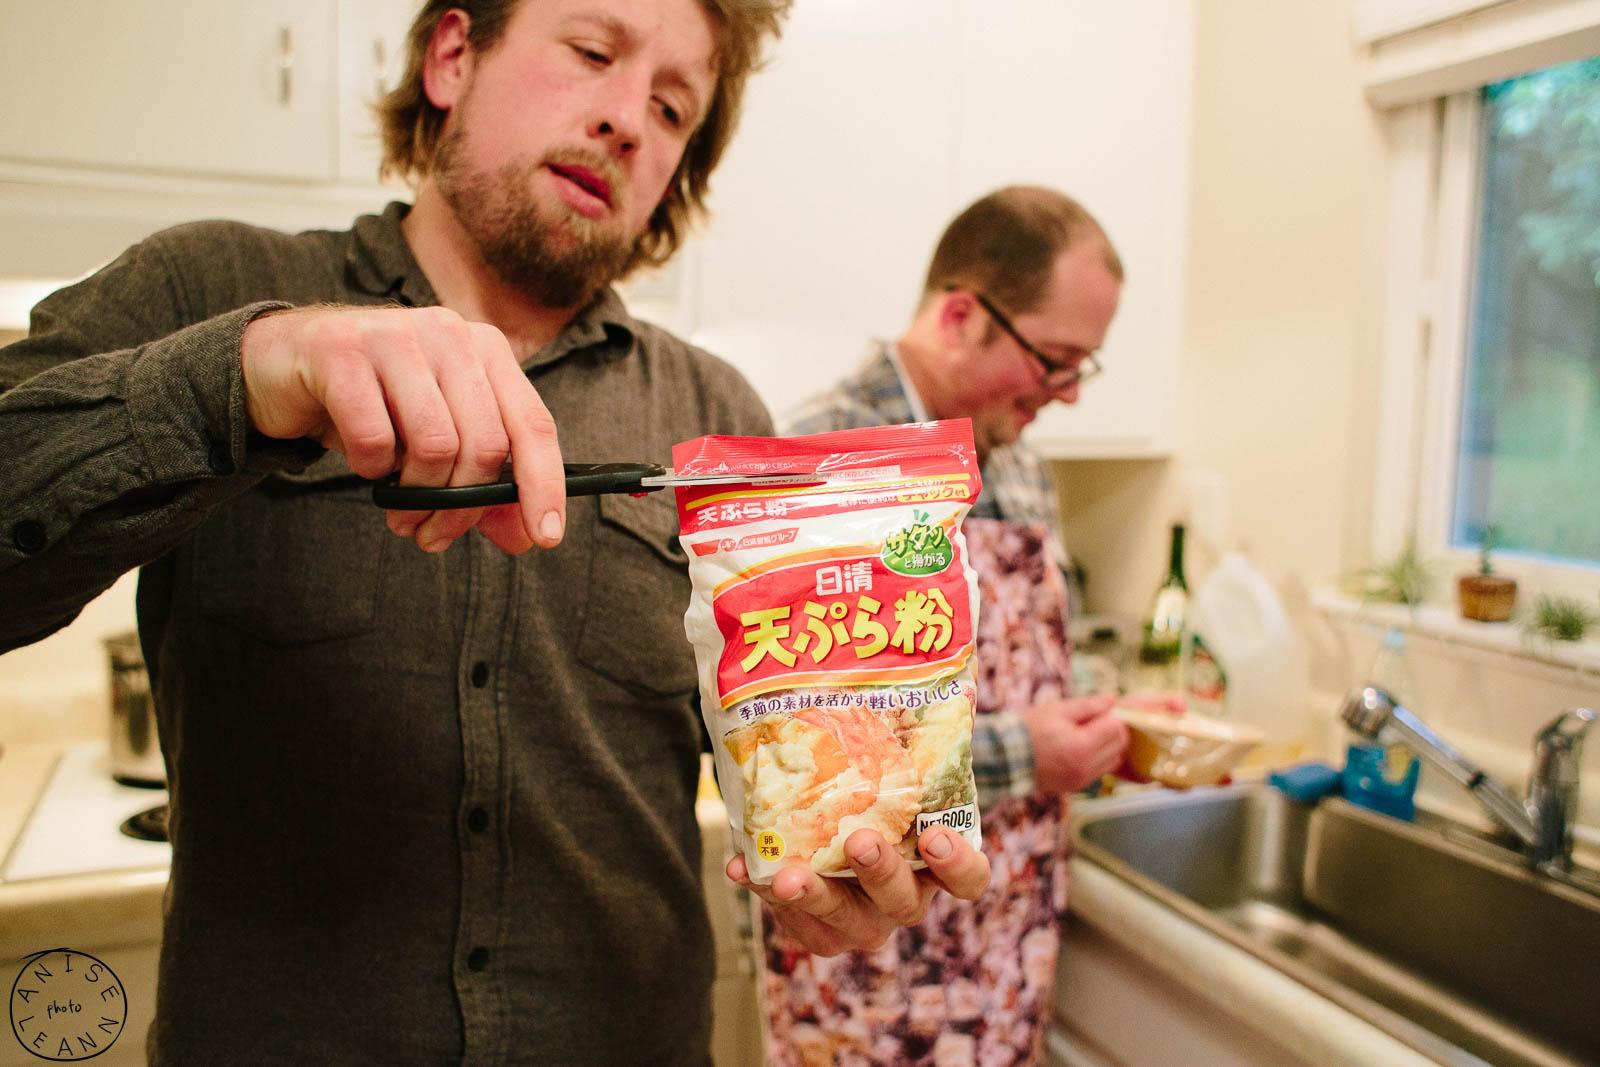 sushi-night-anise-21.jpg